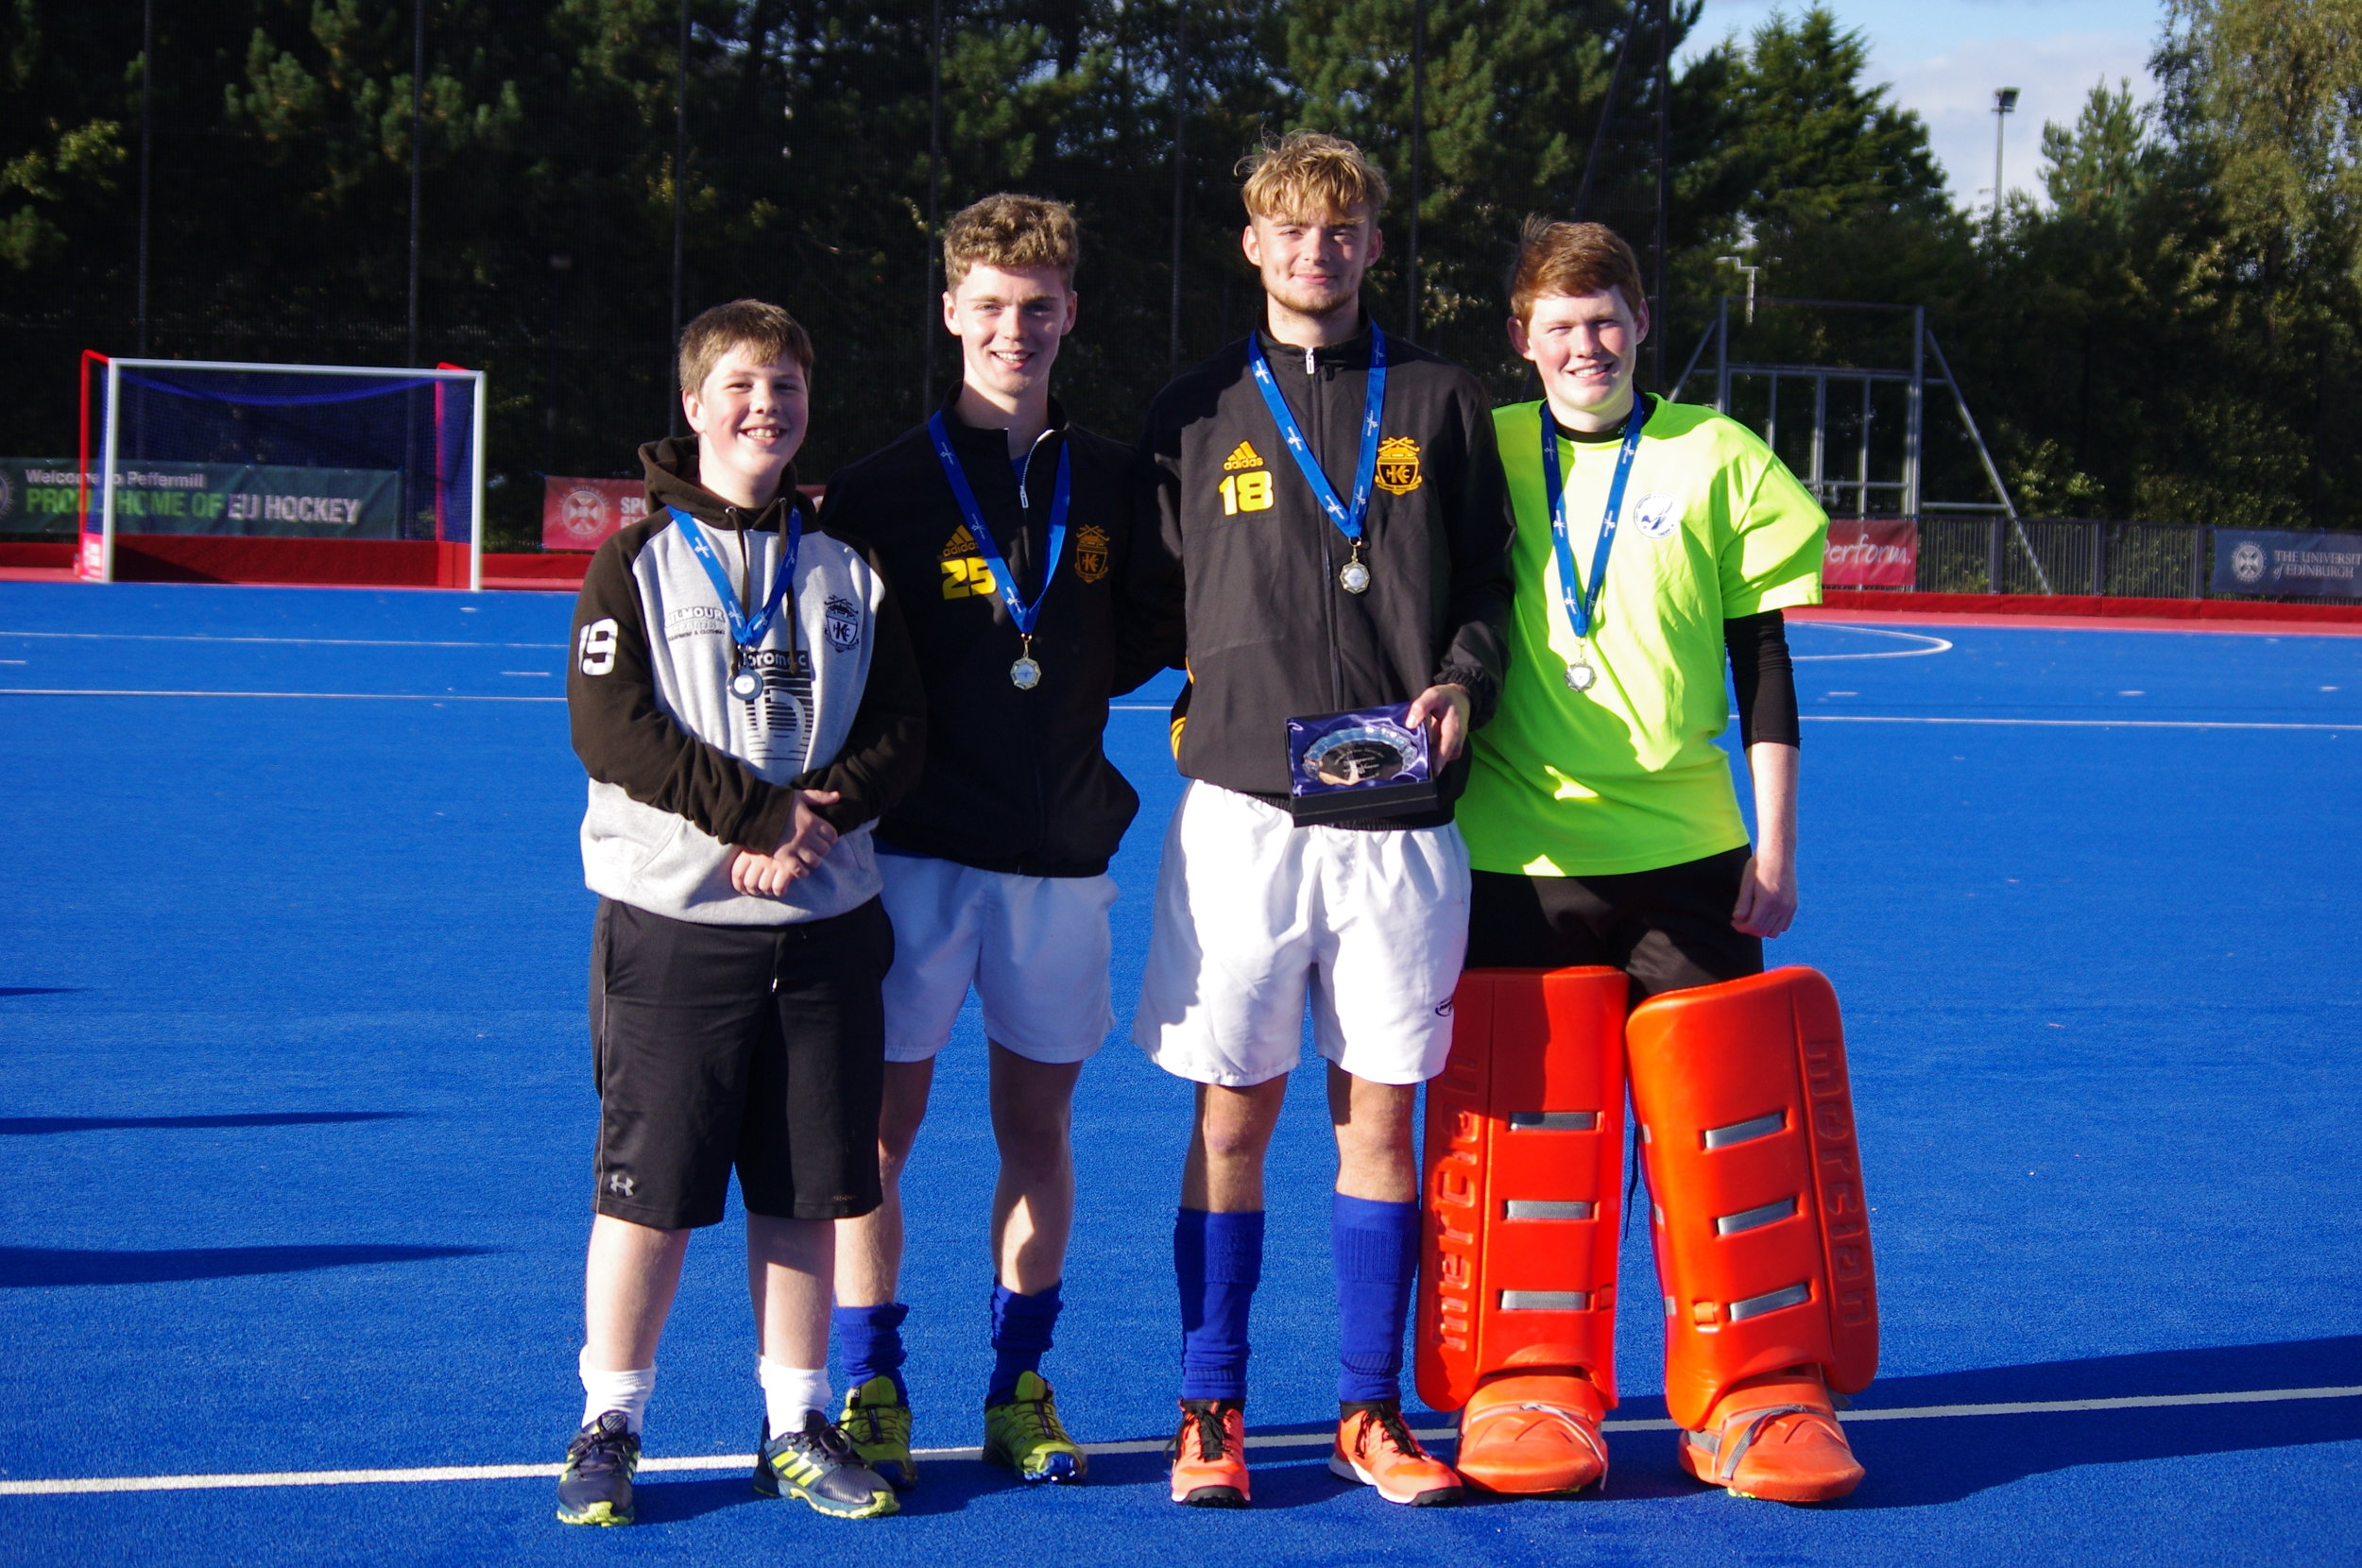 Kelburne players for Team West - Logan U16s, Niall, Finn and Logan for U18s